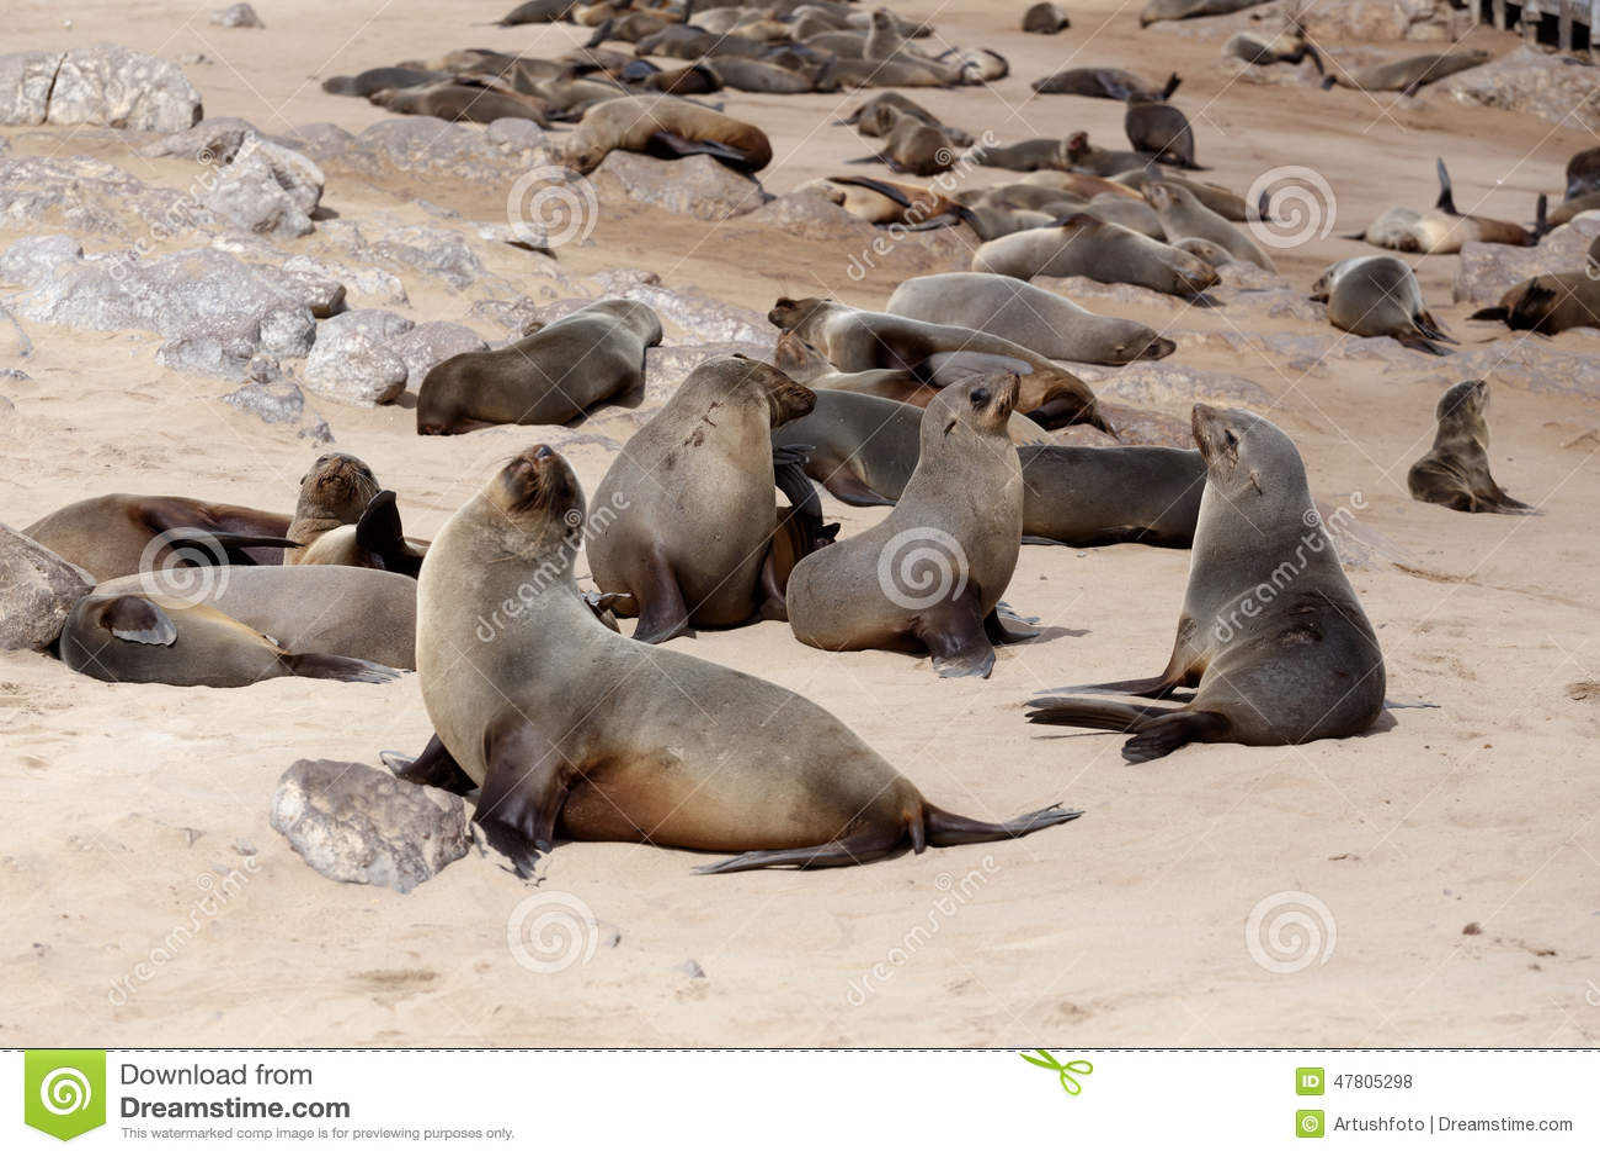 fur seal vs sea lion - DriverLayer Search Engine